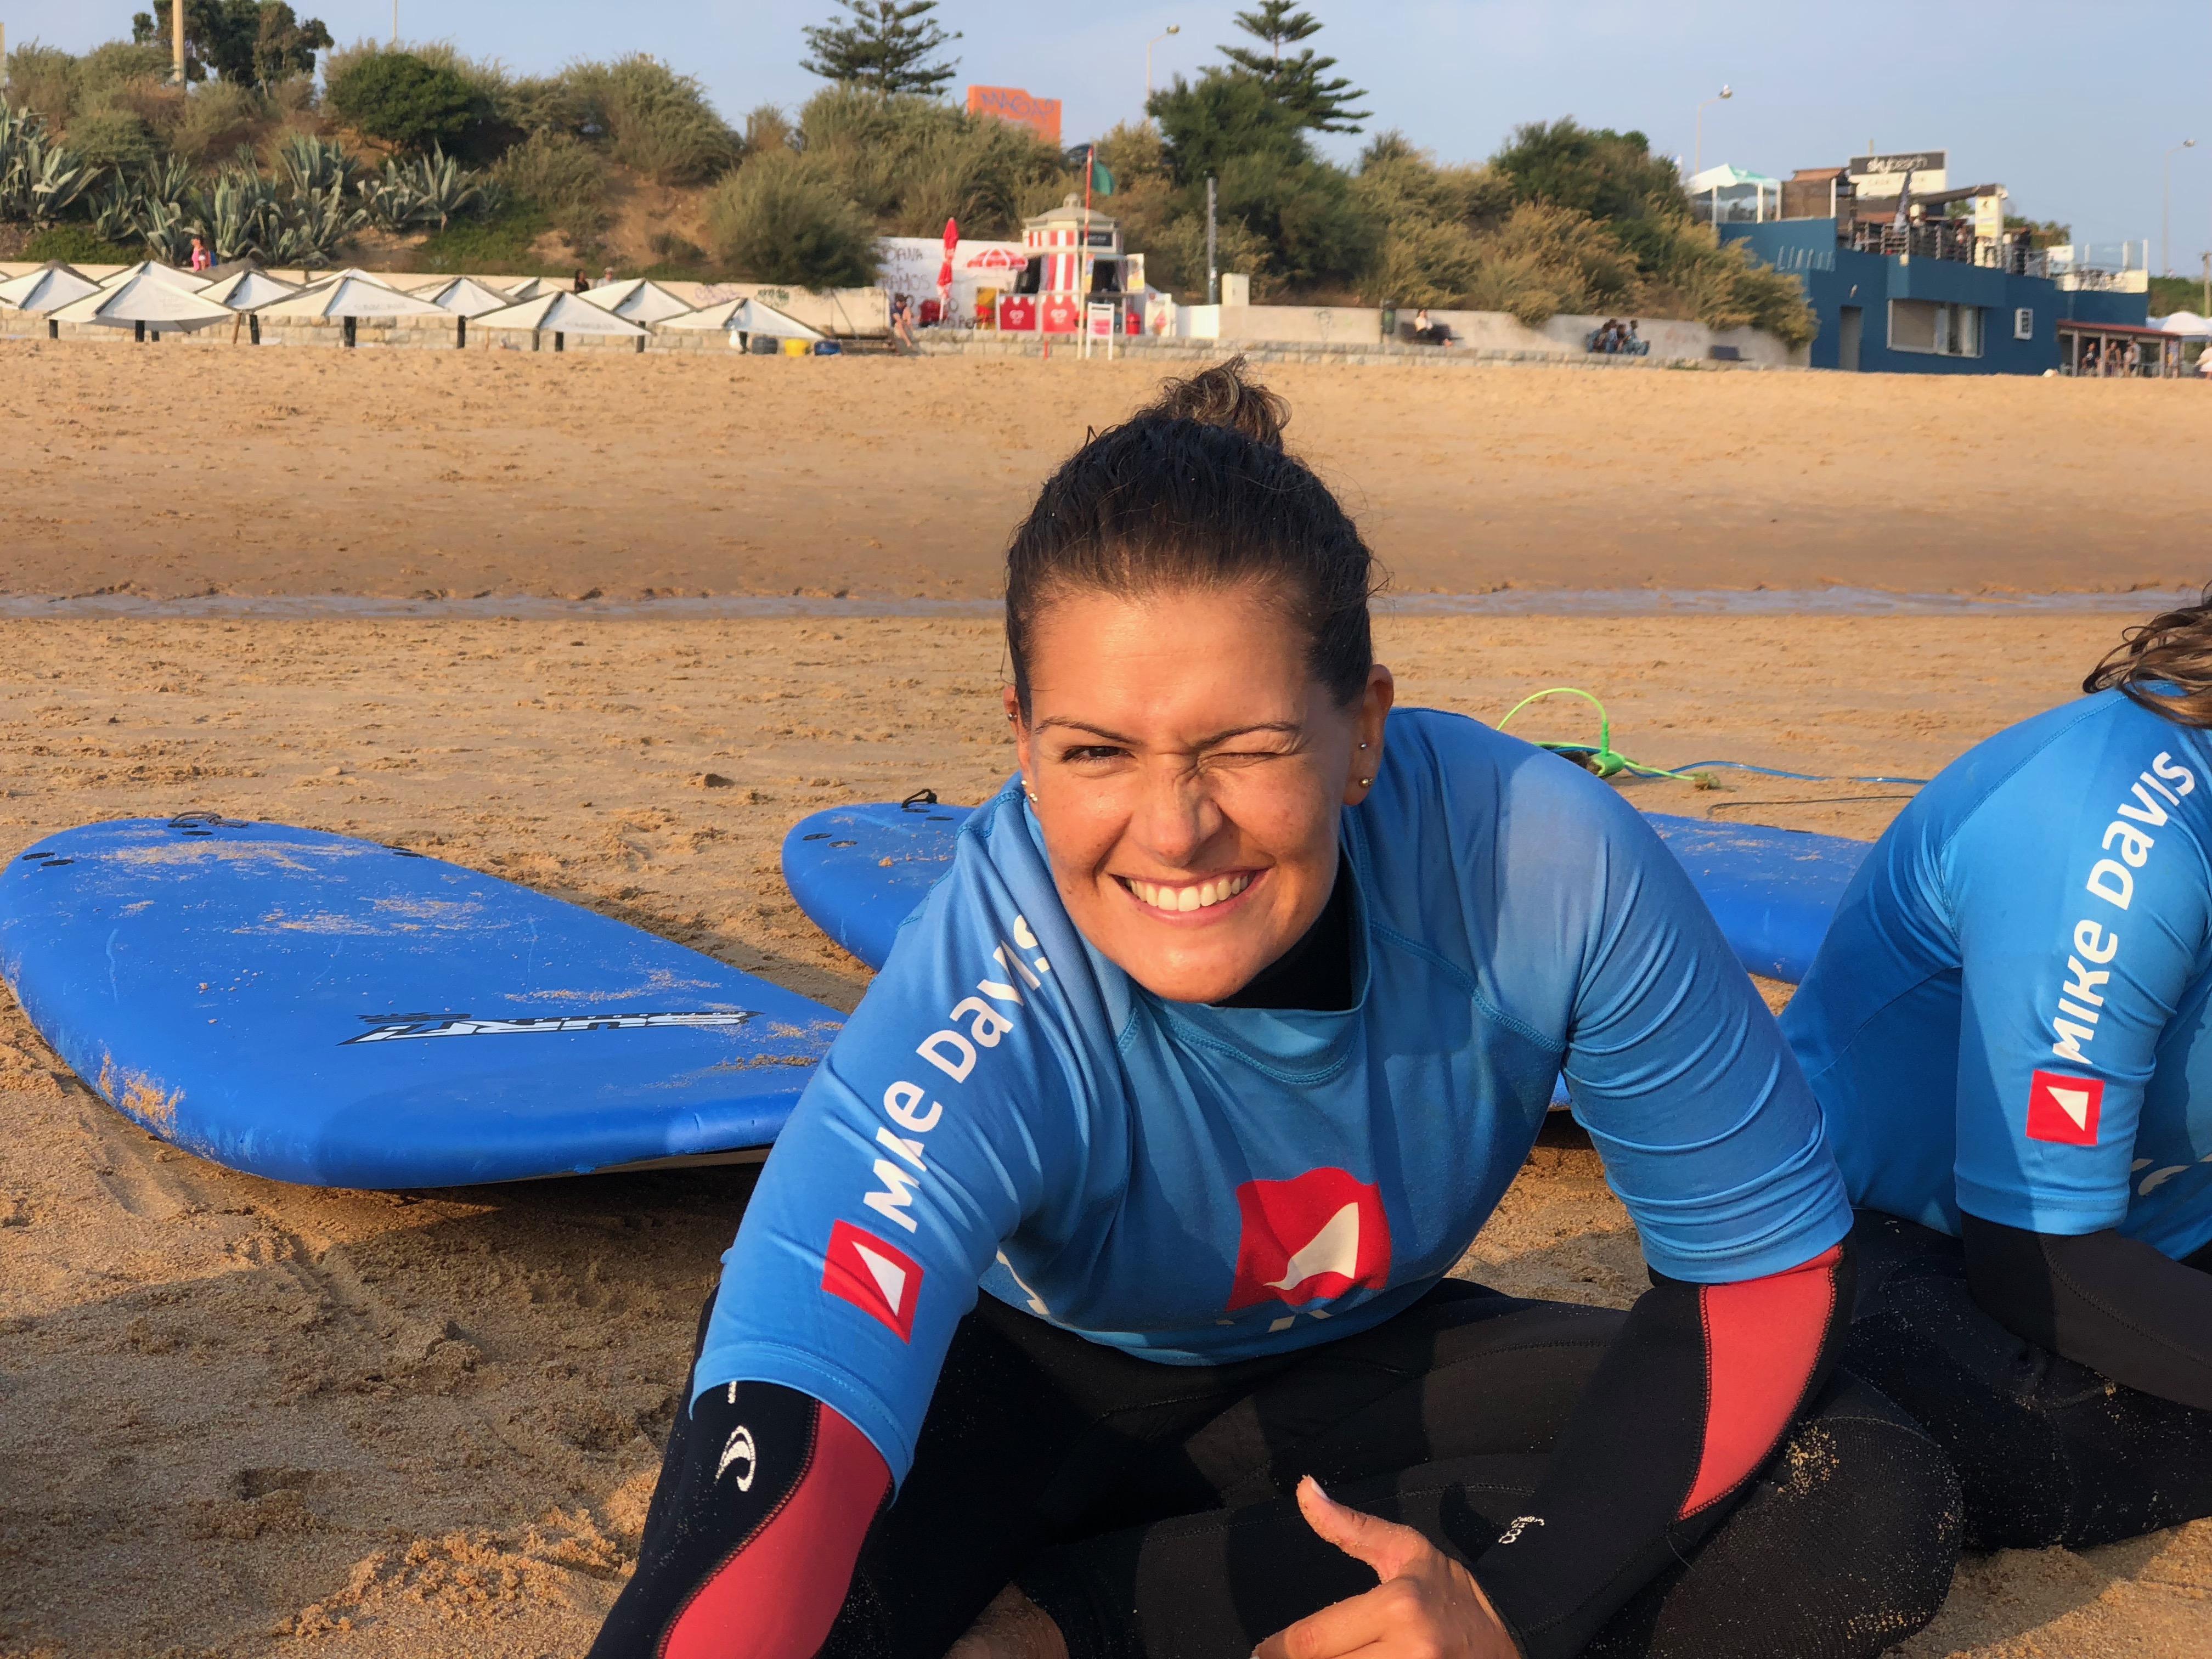 PHC a preparar-se para enfrentar as ondas numa aula de surf